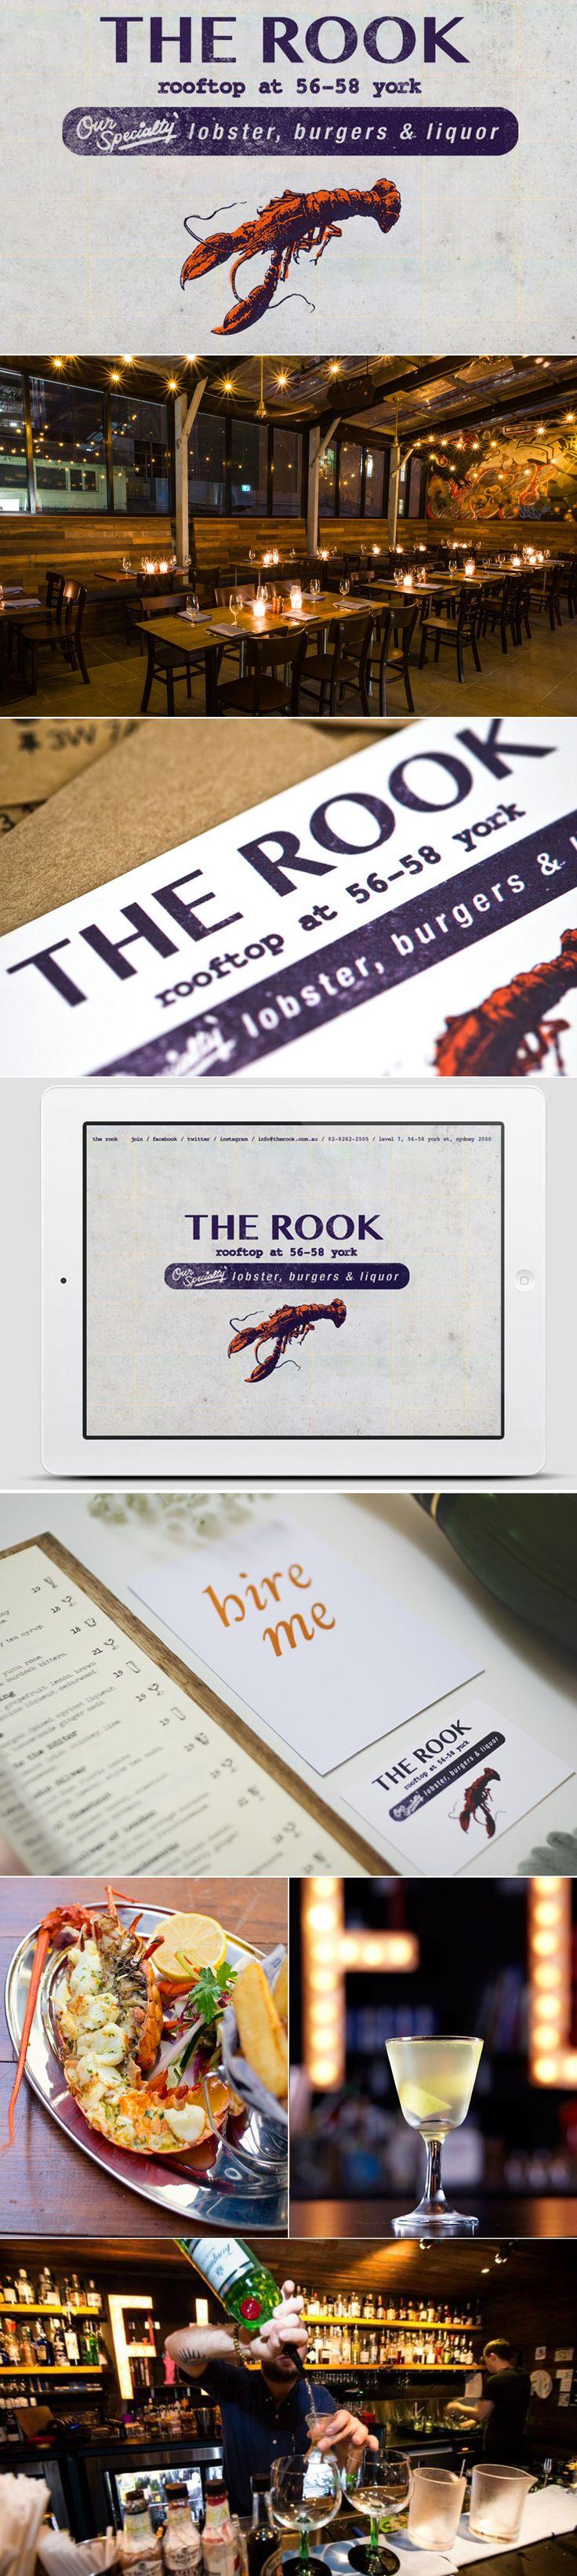 Developed the branding for new Sydney CBD venue: The Rook.